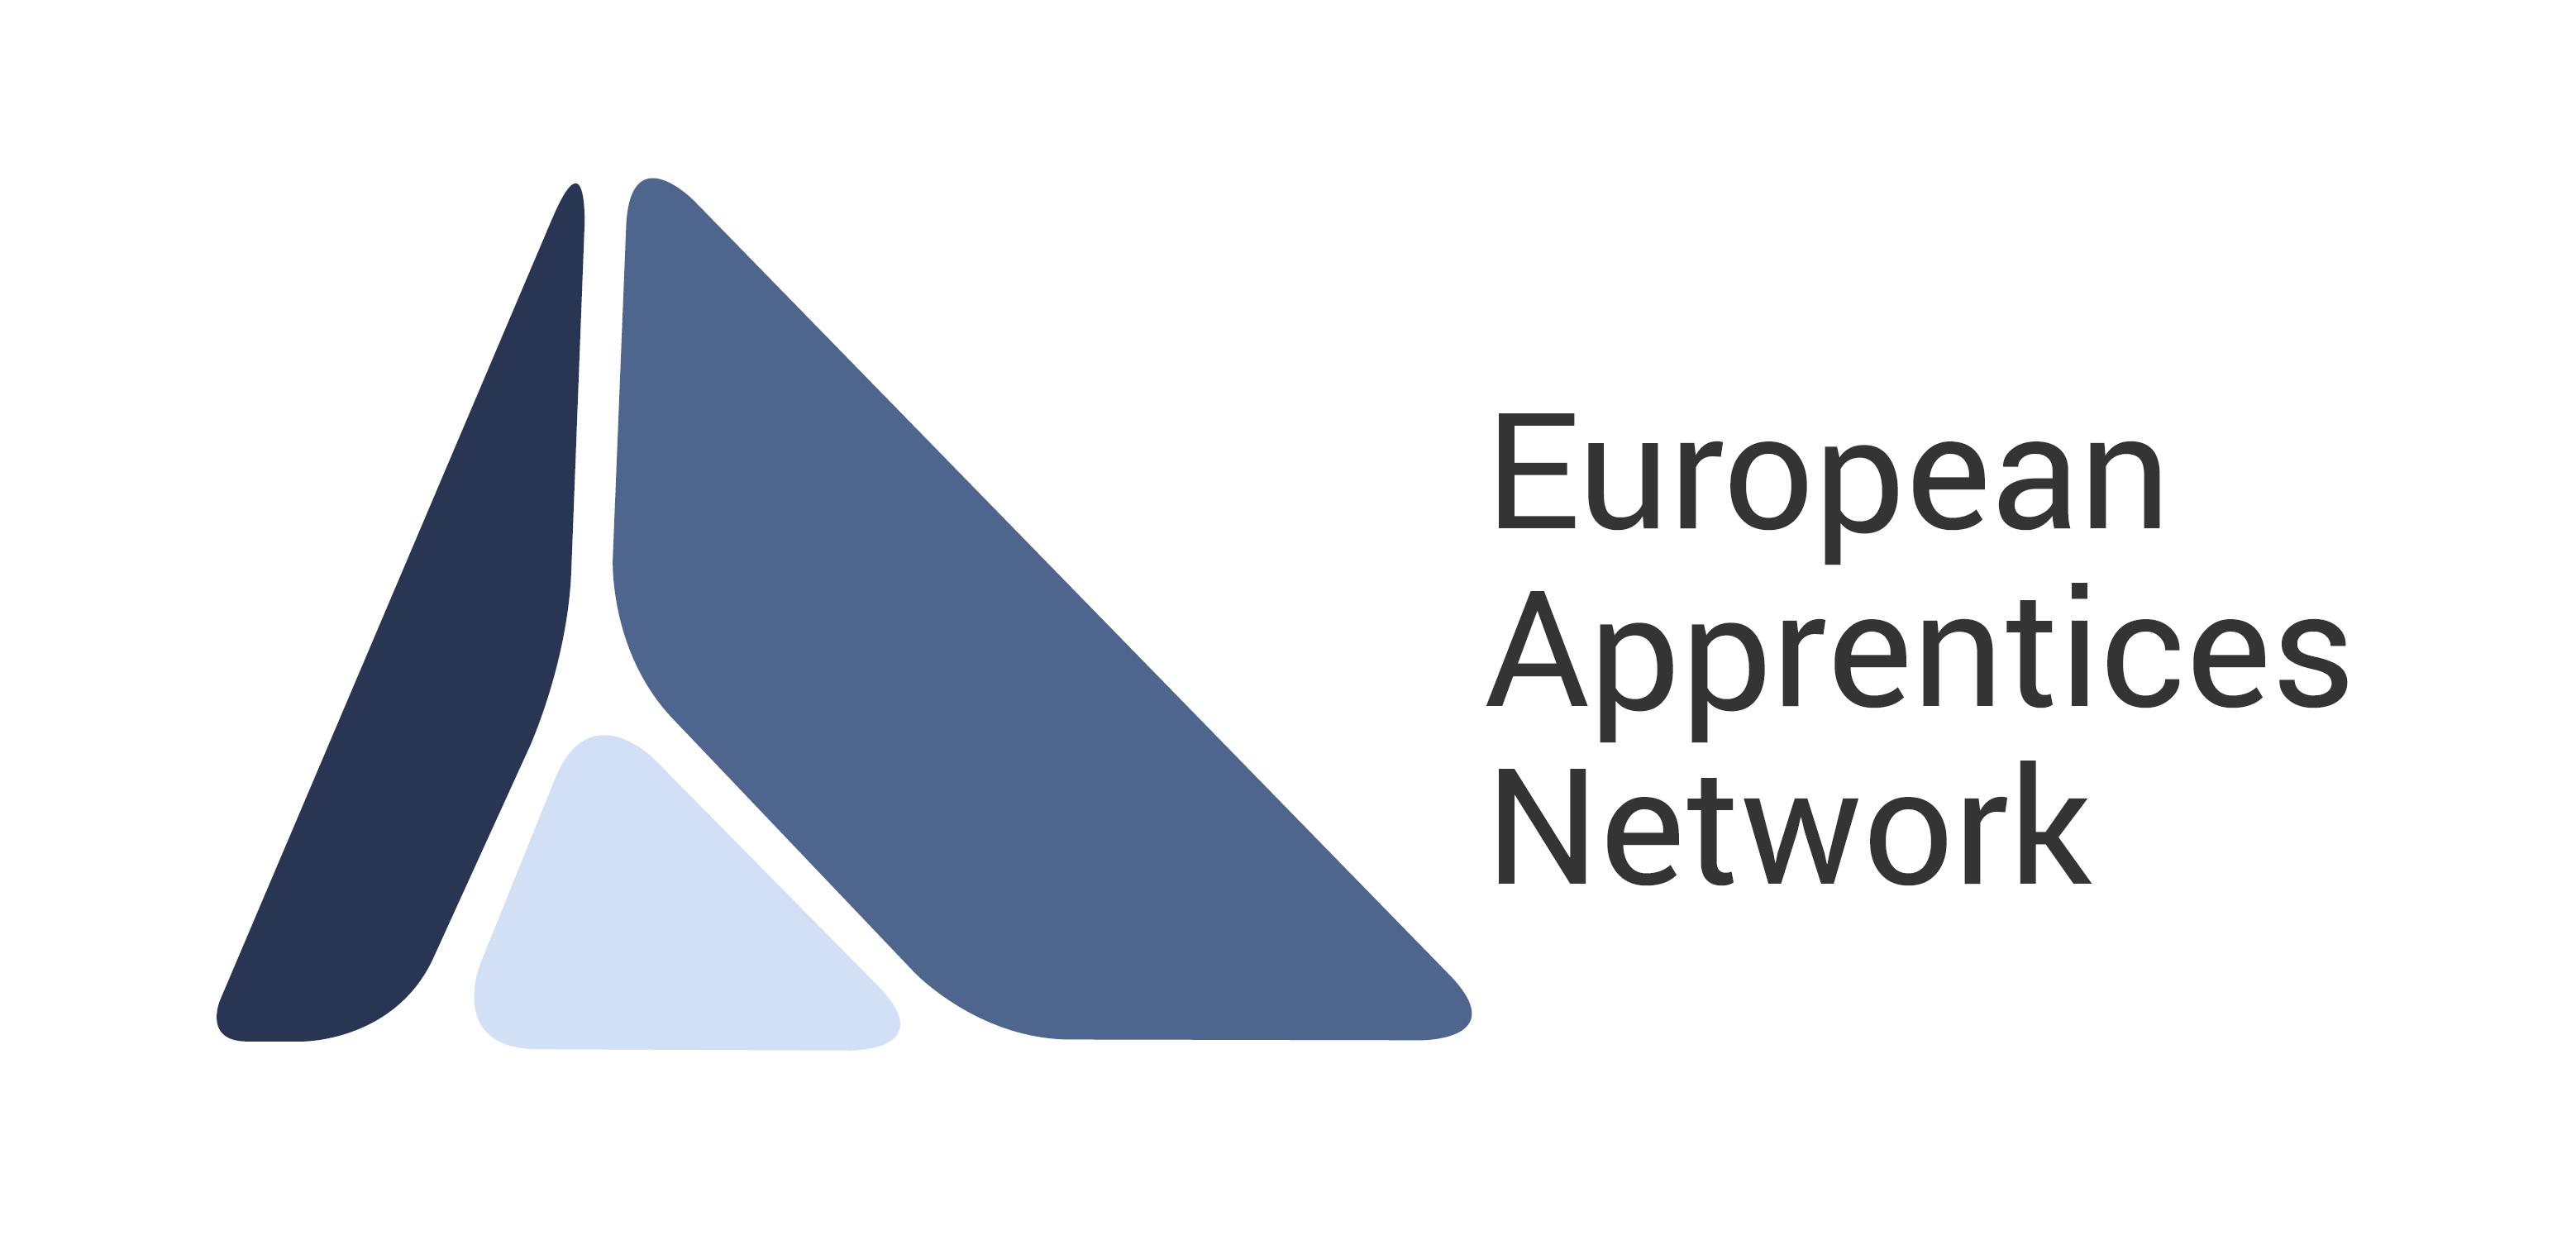 European Apprentices Network